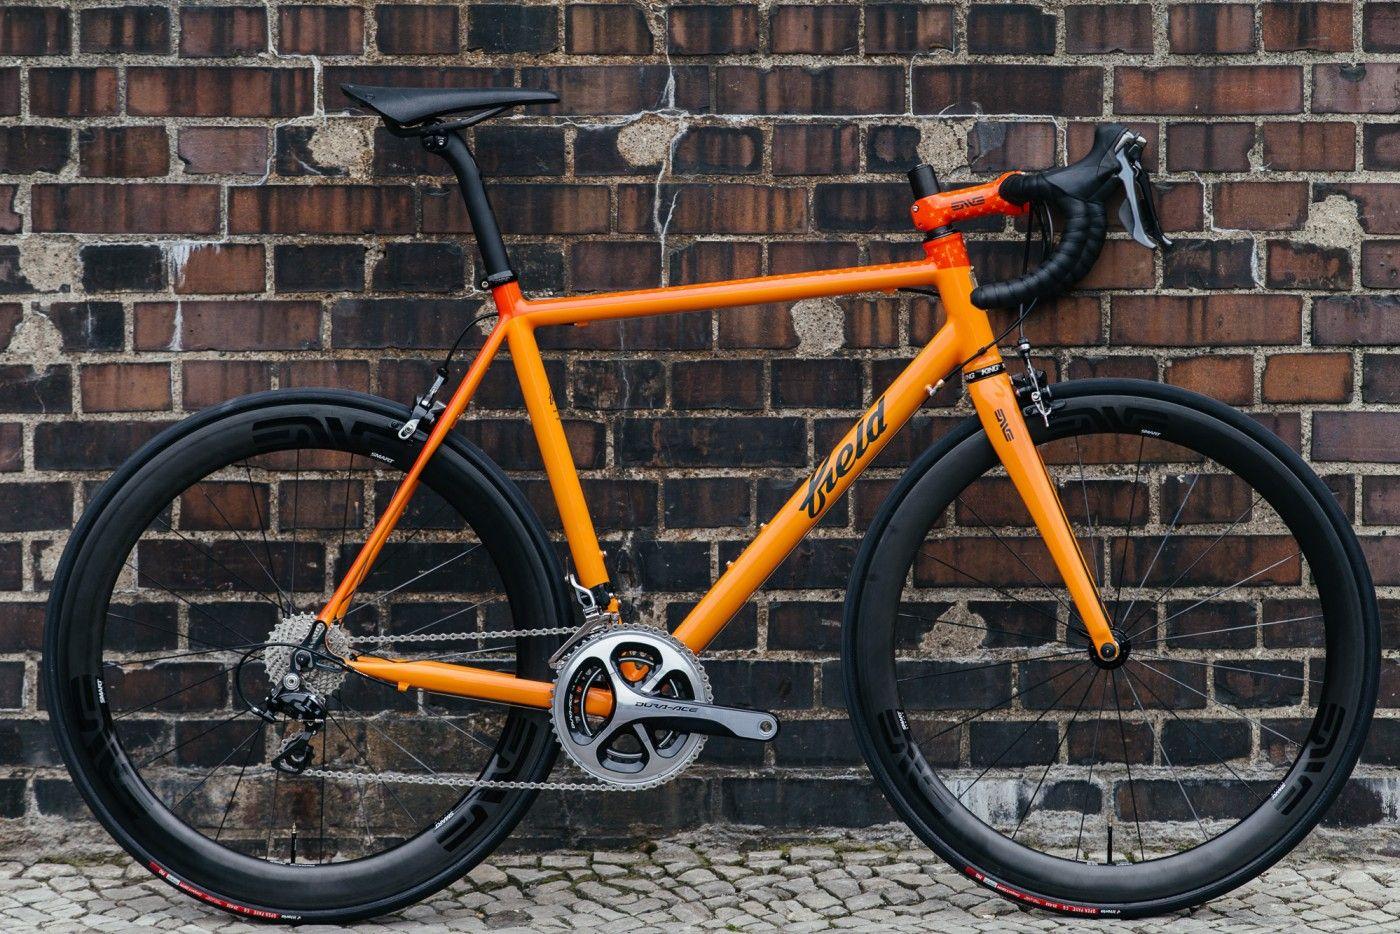 Field Cycles Orange Road Bike with Dura Ace | The Radavist ...